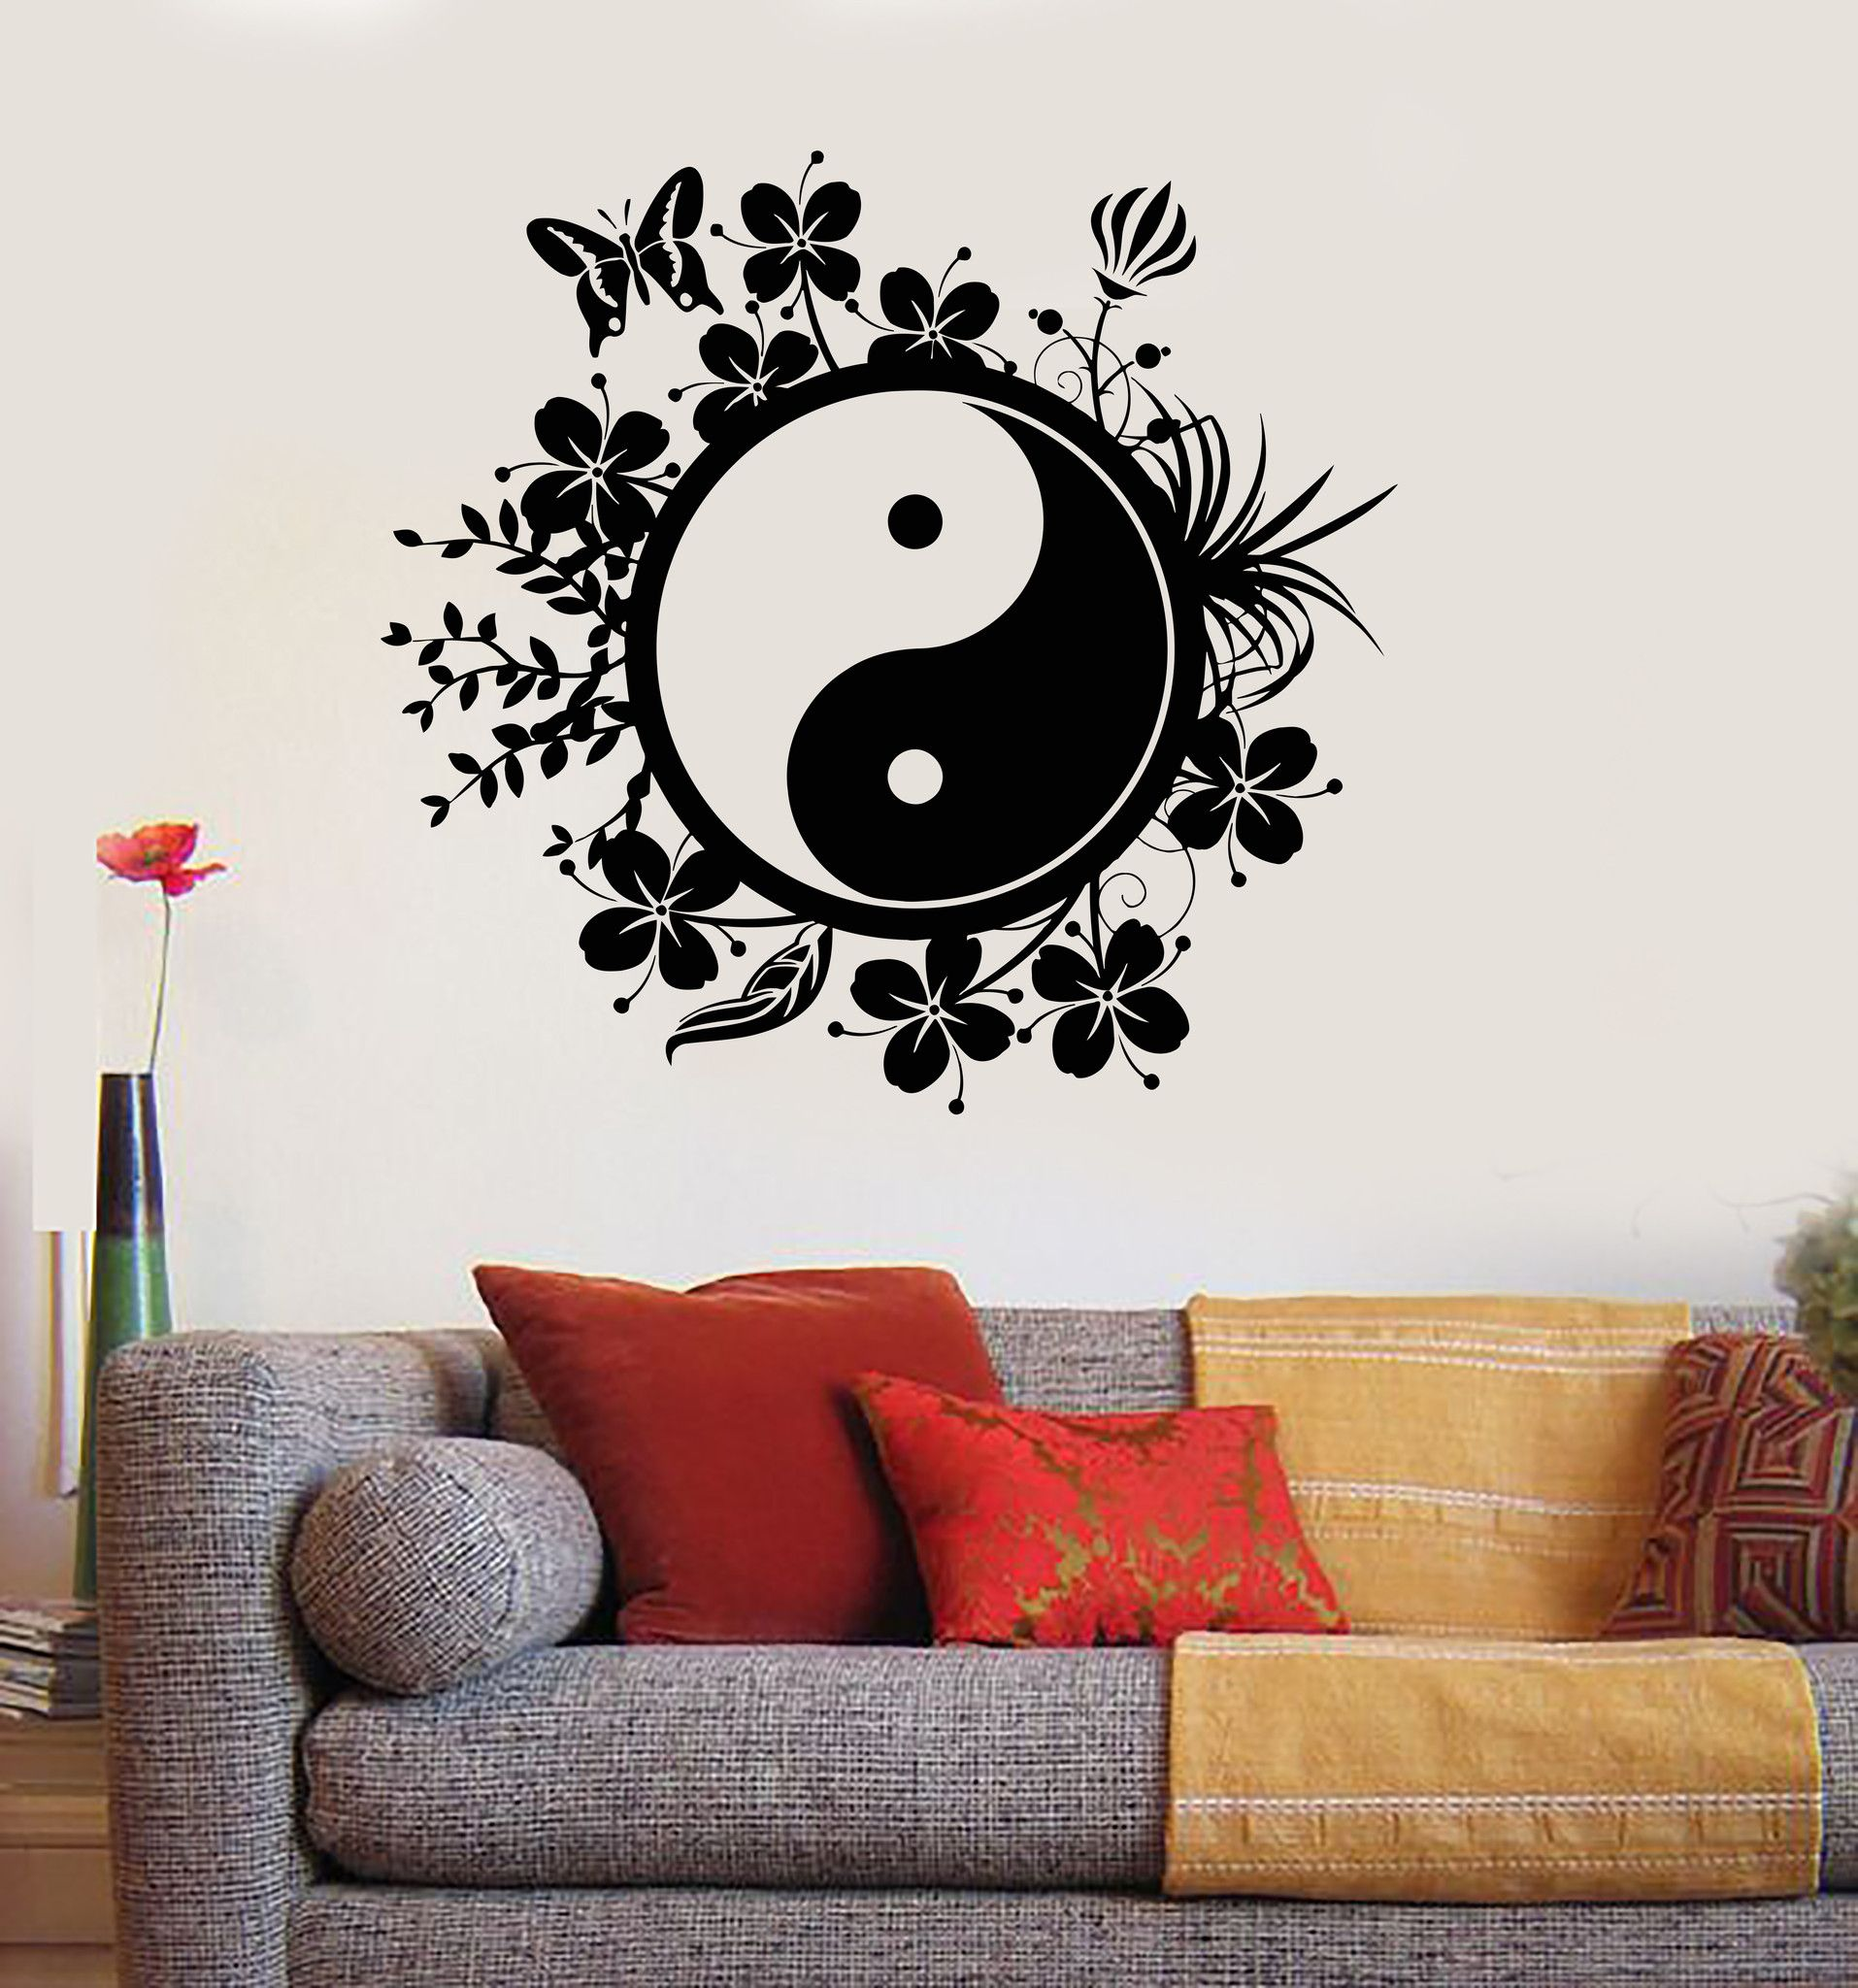 Vinyl Wall Decal Yin Yang Tai Chi Chinese Philosophy